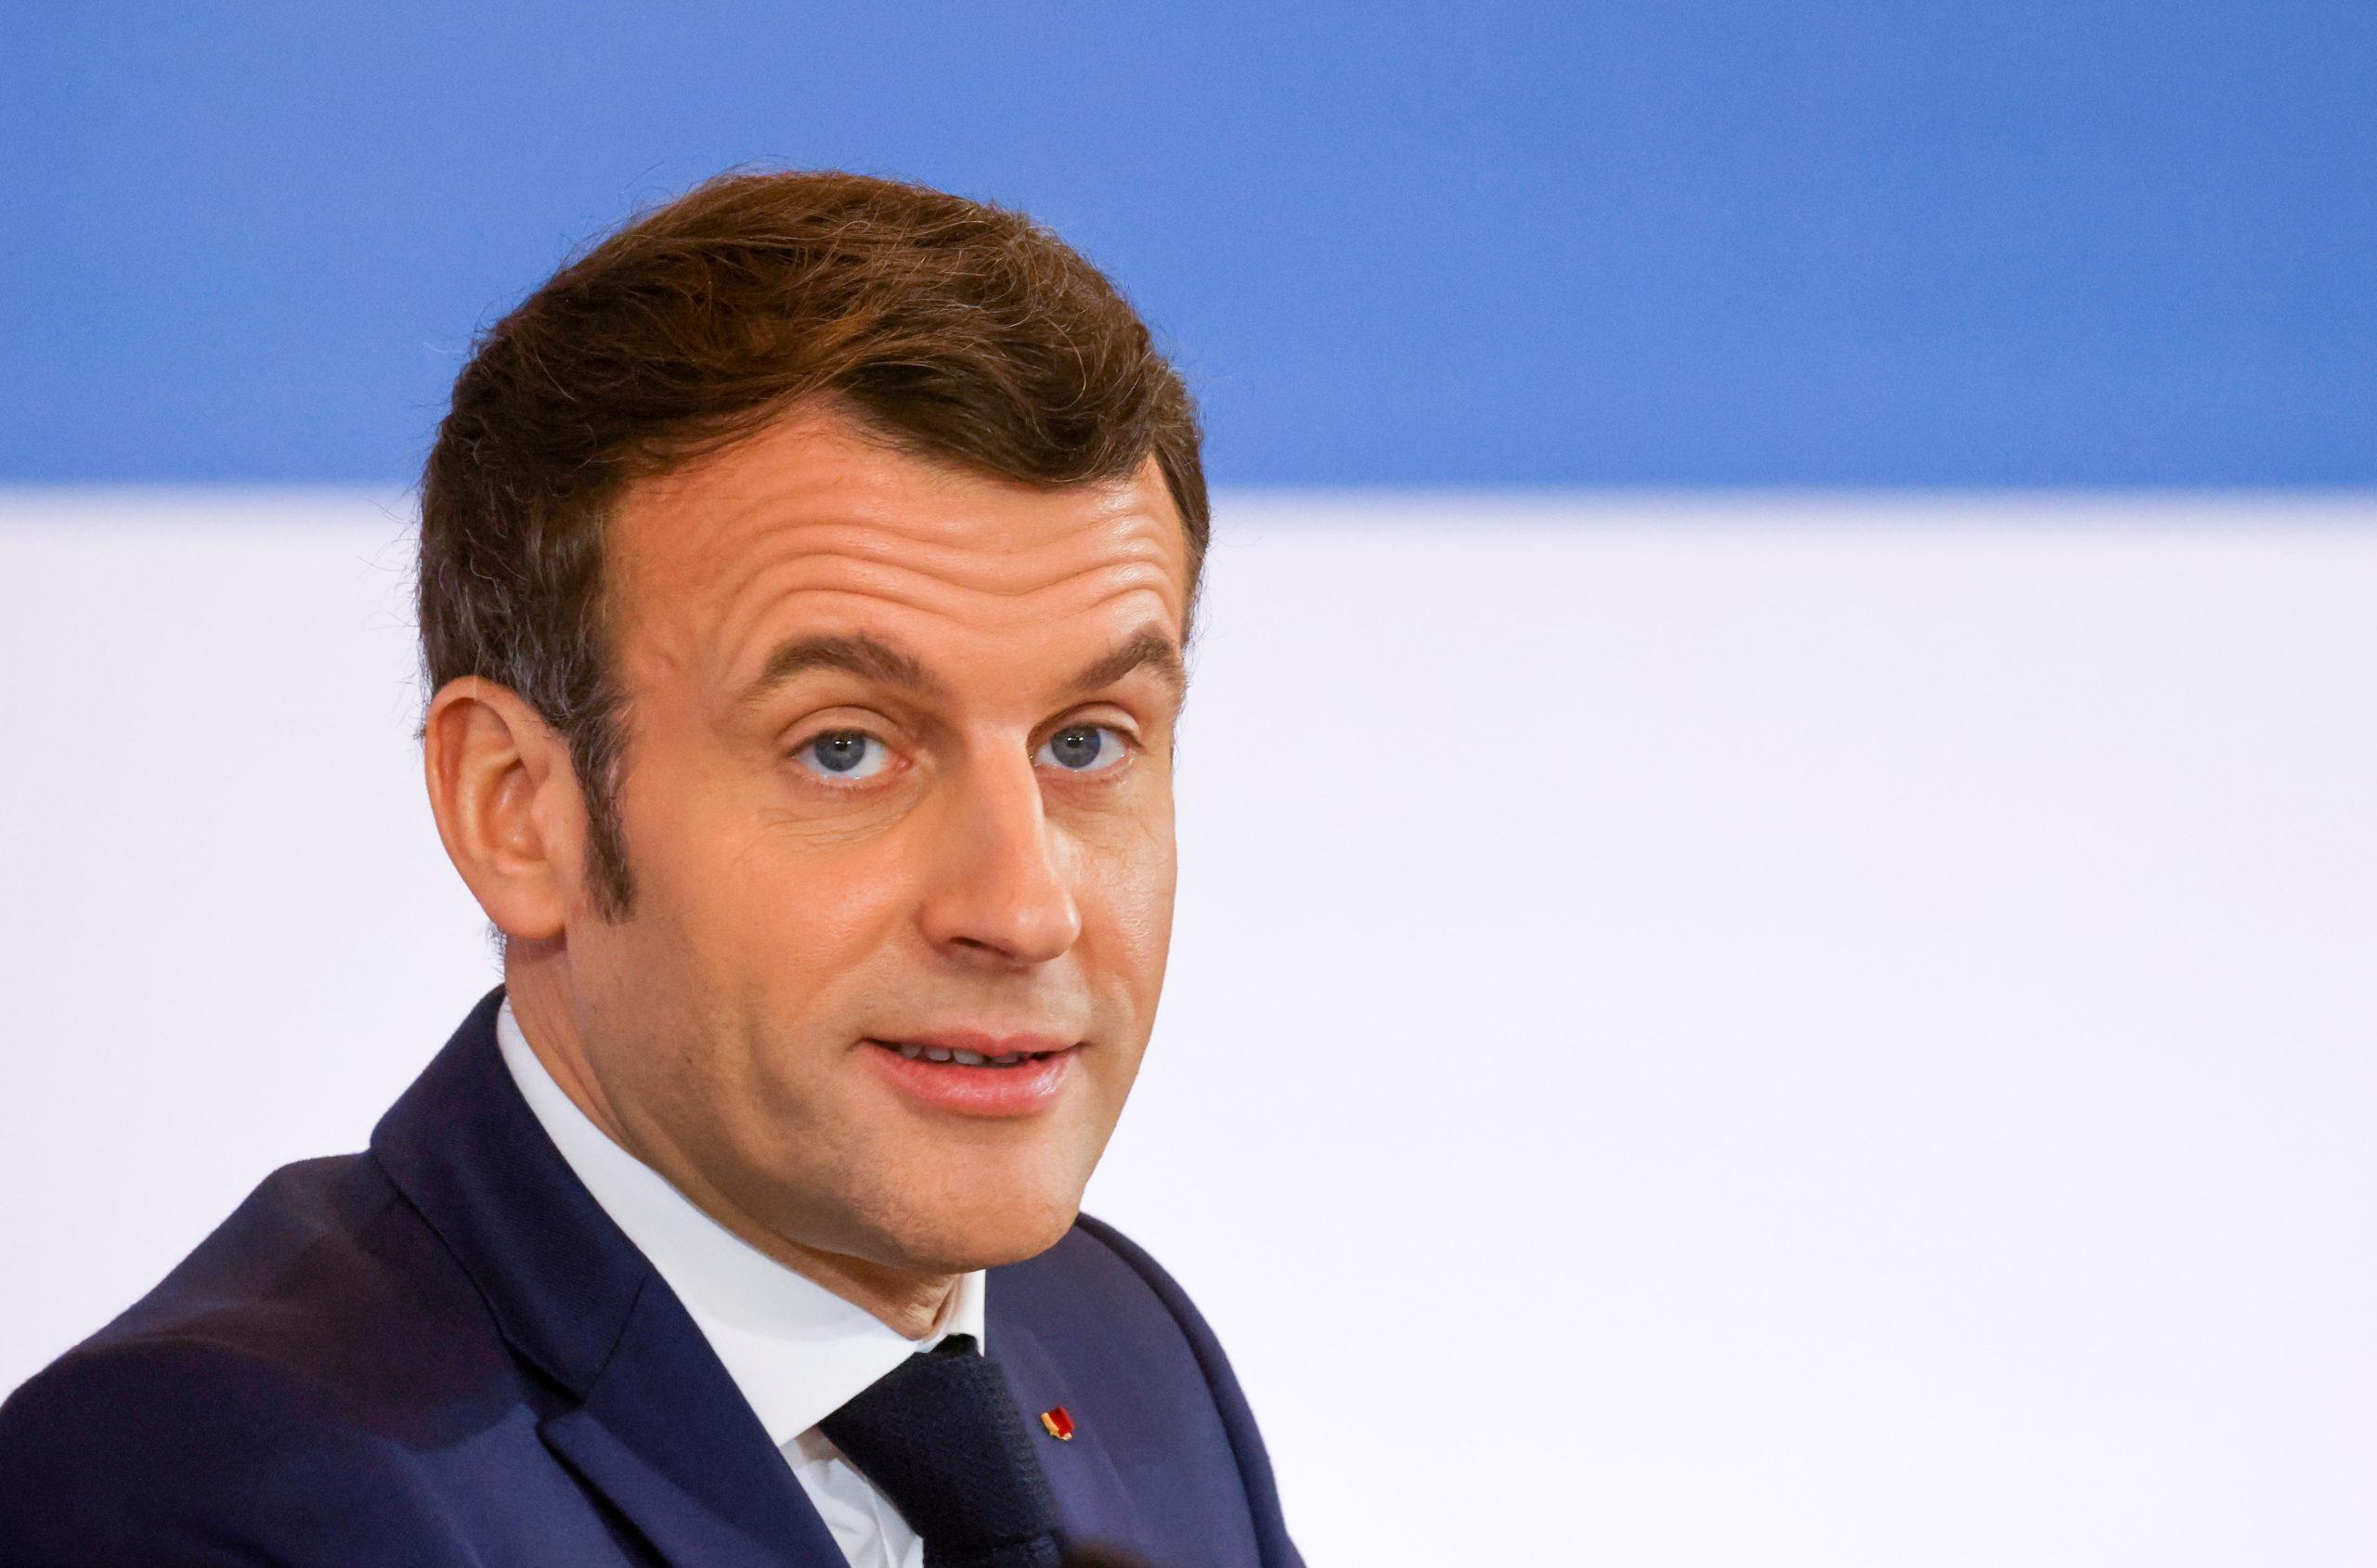 Prestation de serment: Emmanuel Macron félicite Joe Biden